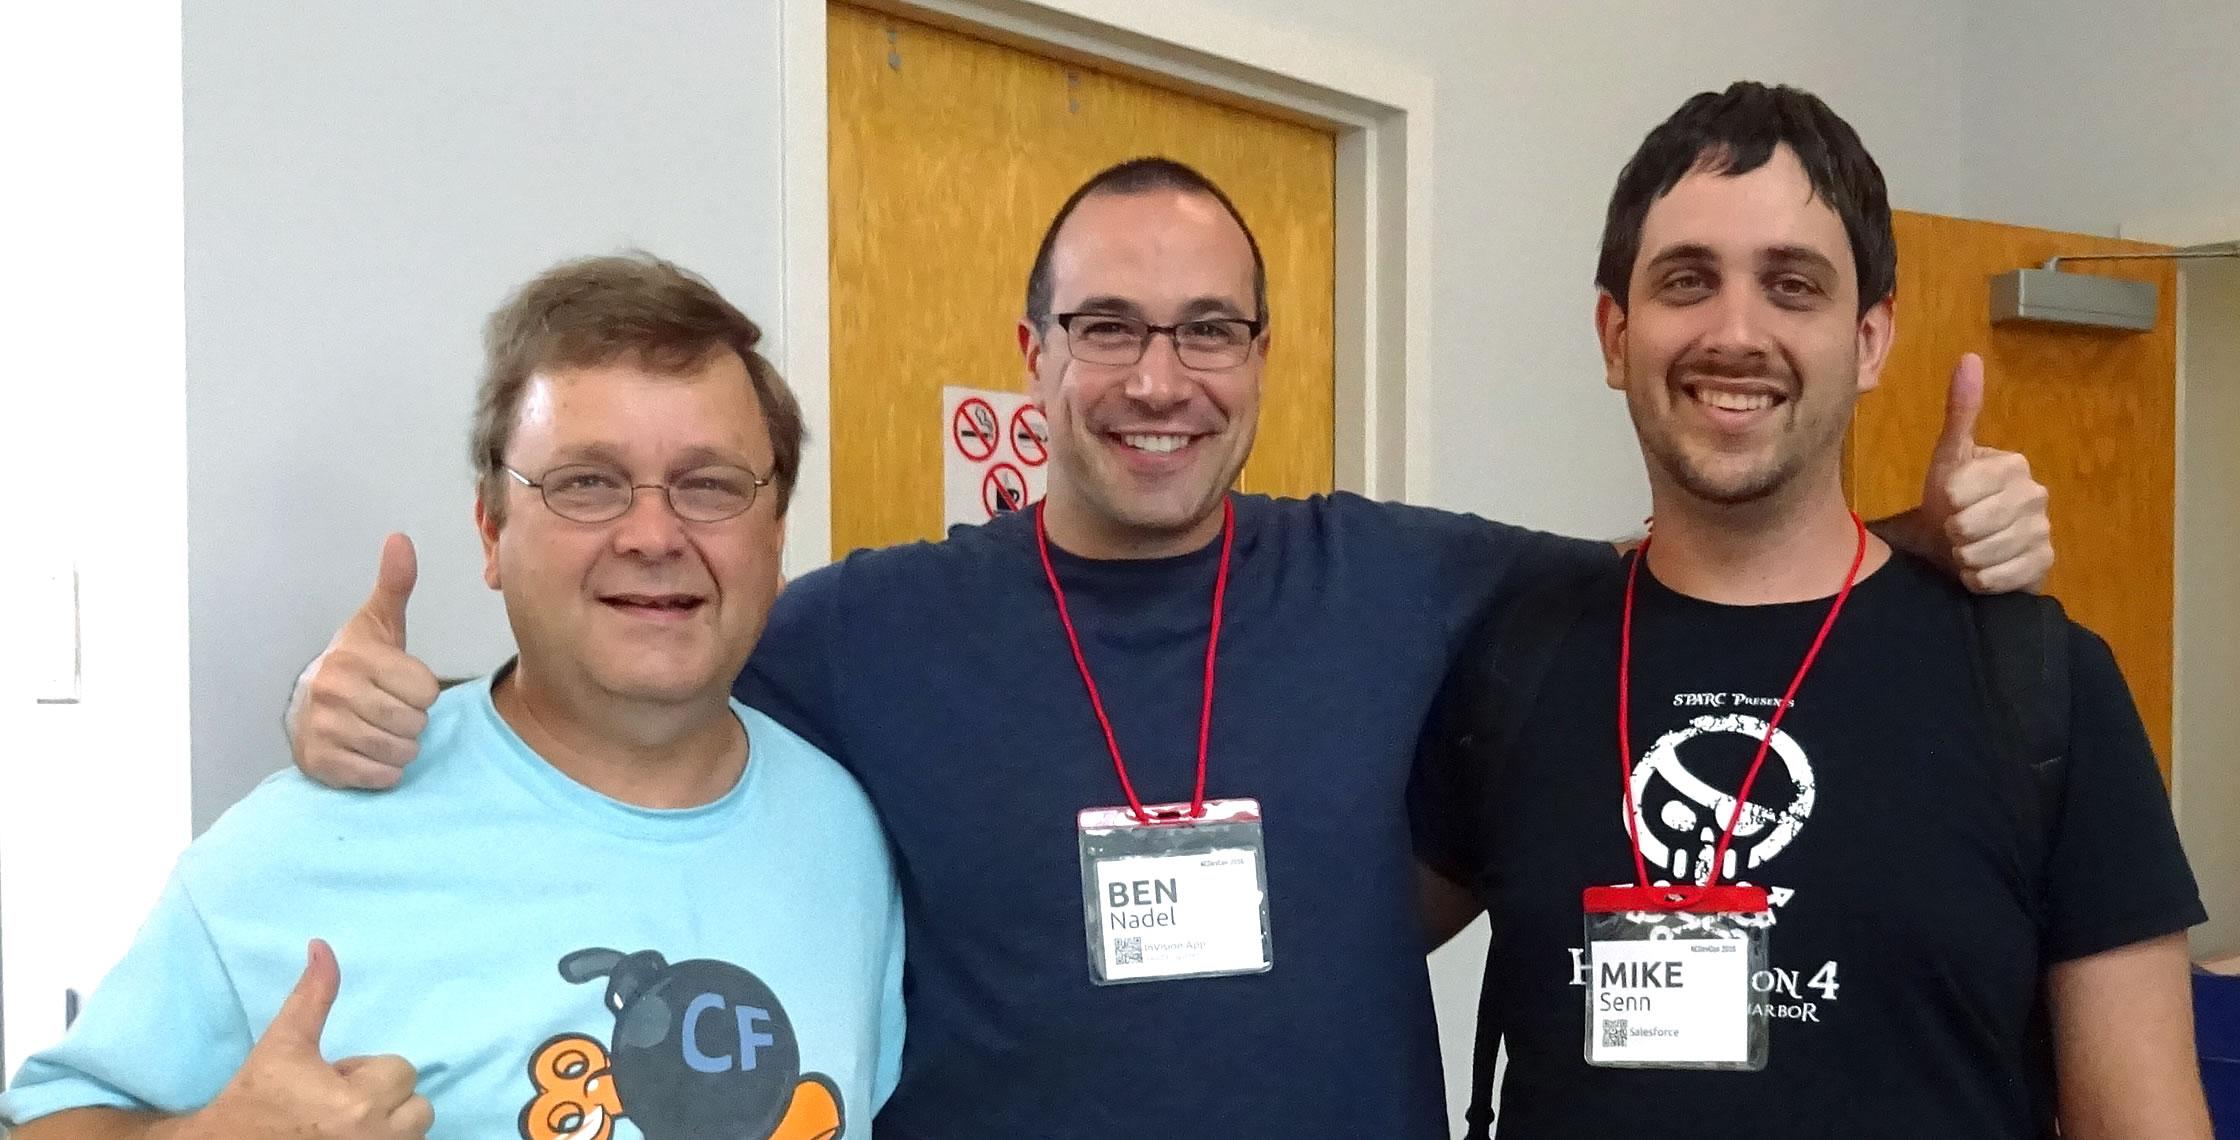 Ben Nadel at NCDevCon 2016 (Raleigh, NC) with: Phillip Senn and Michael Senn